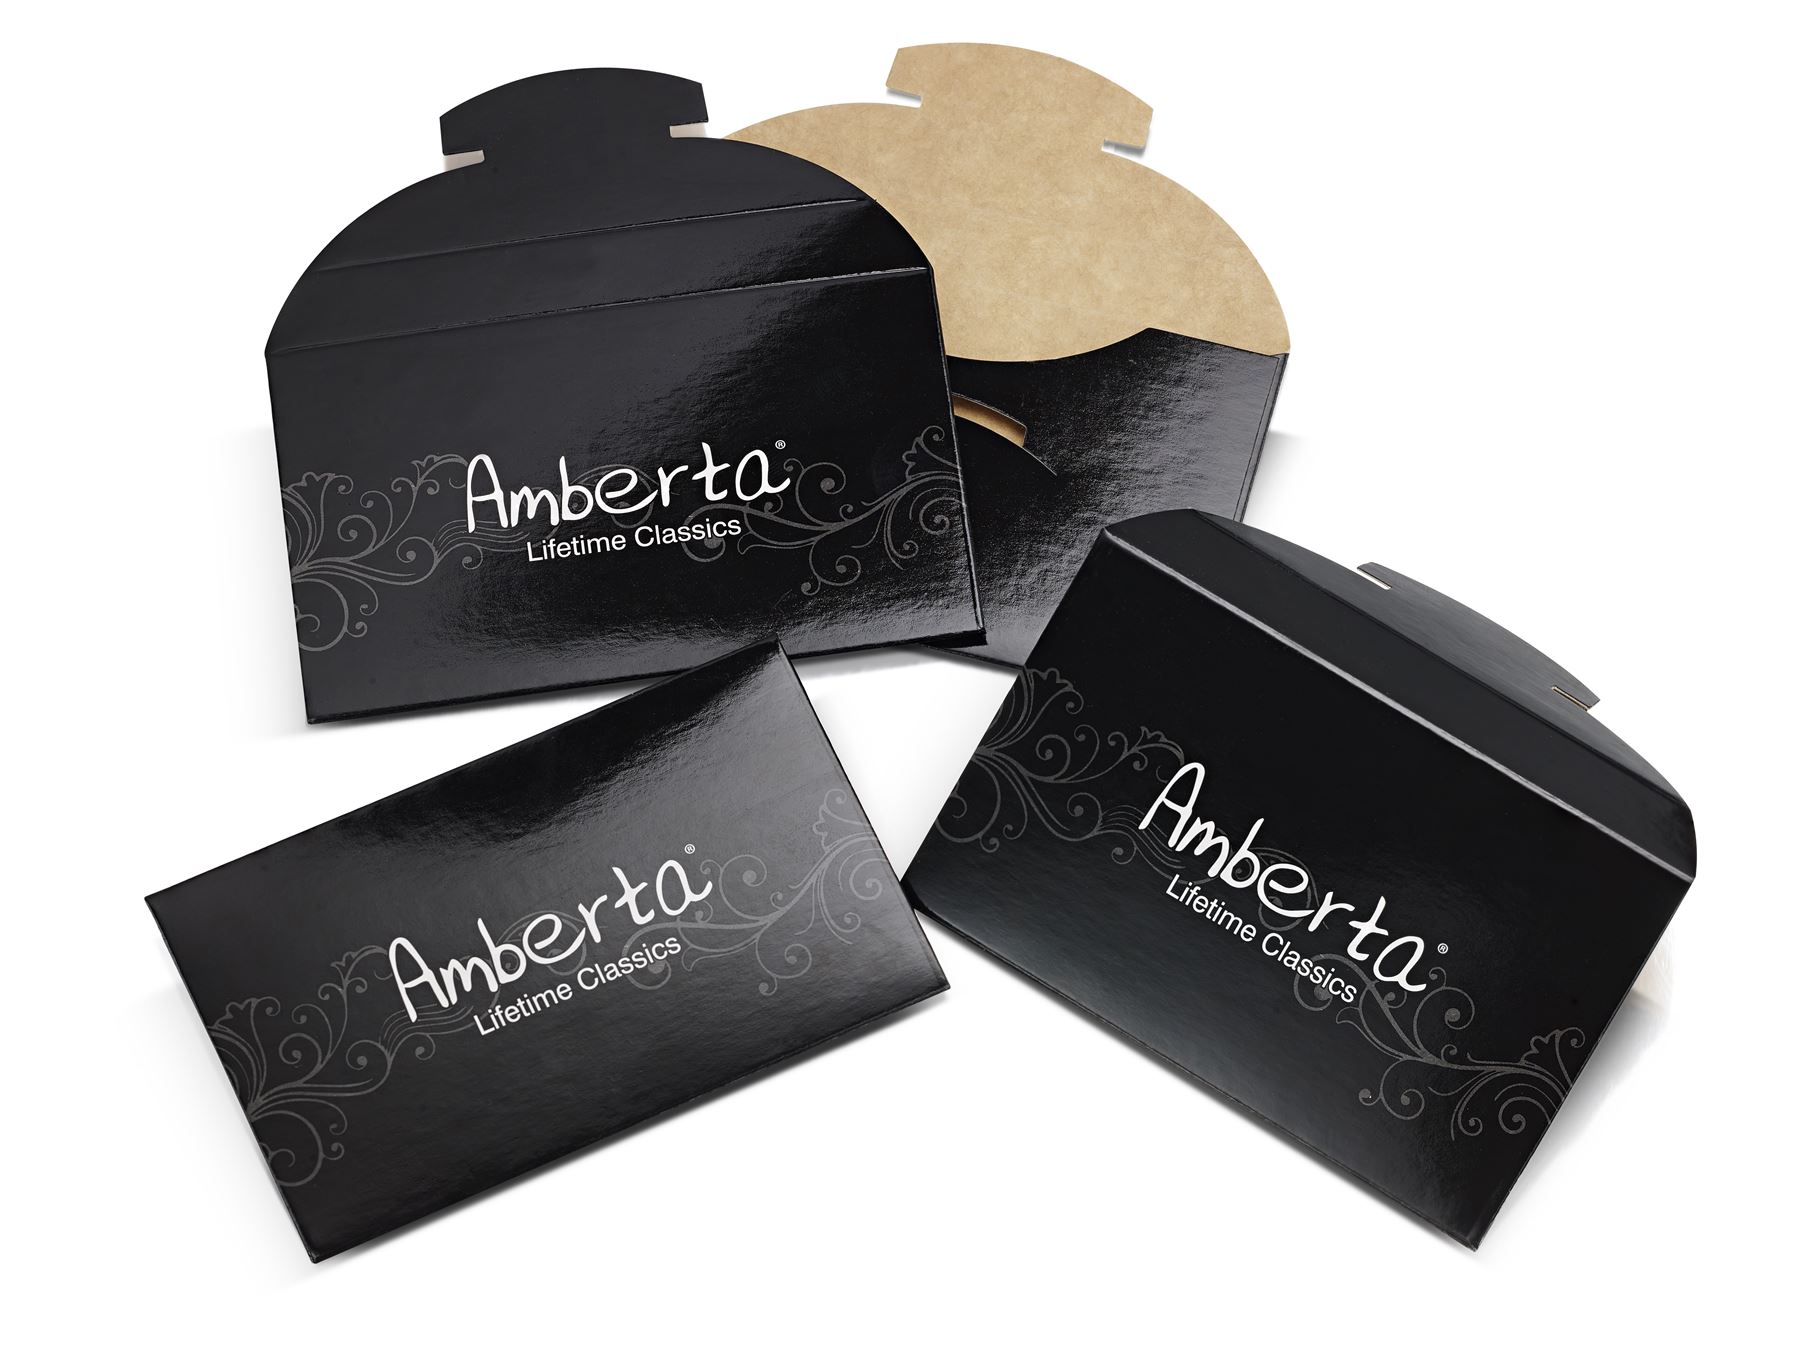 Amberta-Jewelry-925-Sterling-Silver-Adjustable-Bracelet-Italian-Bangle-for-Women thumbnail 16